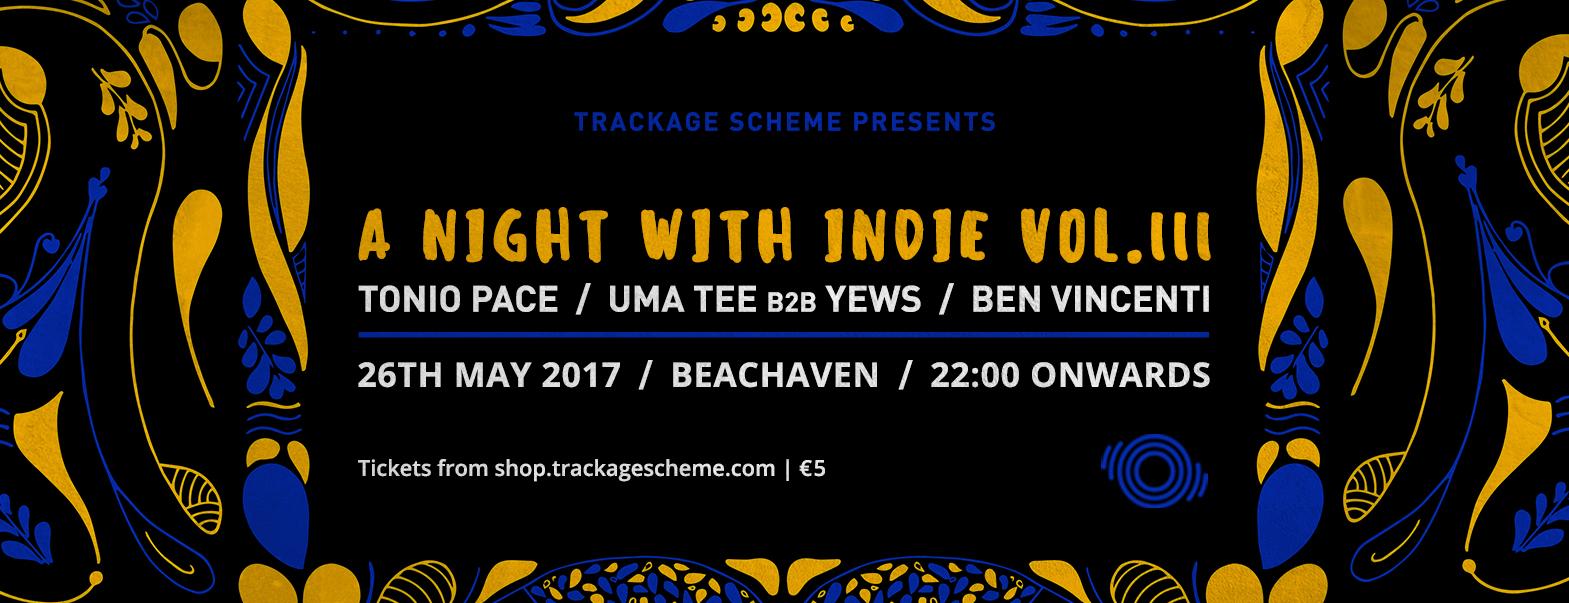 a night with indie volume 3 alternative event malta